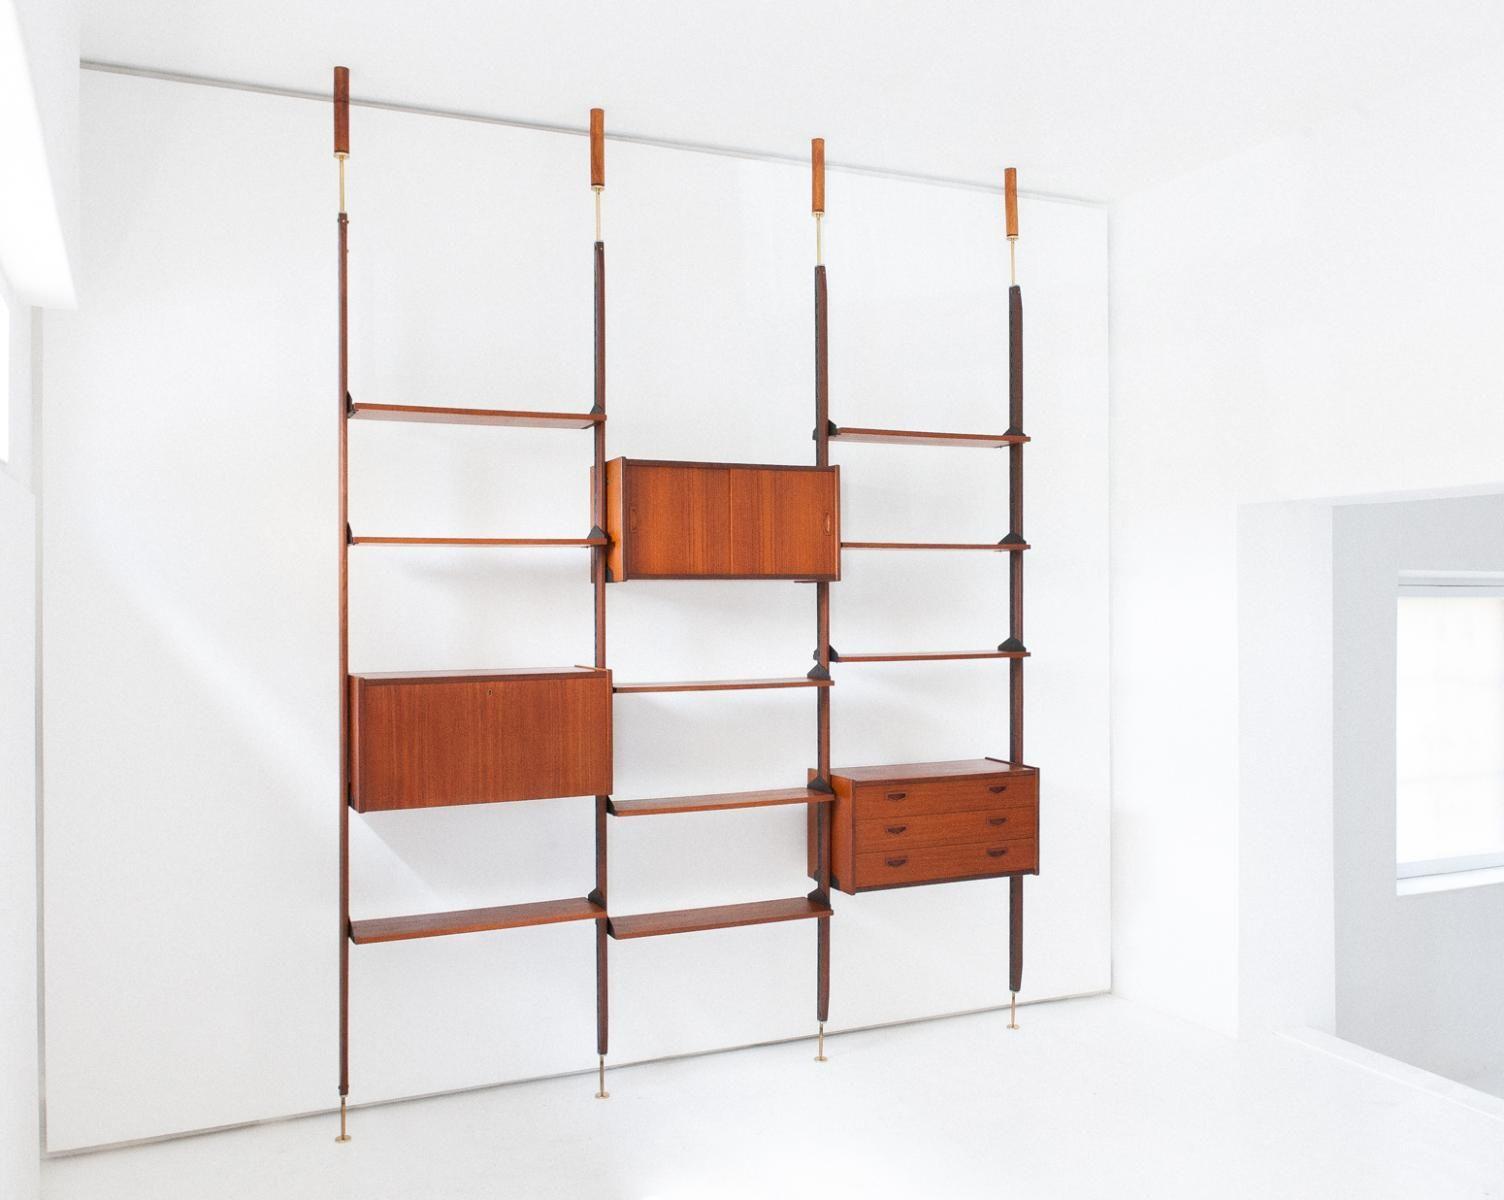 Italian Teak and Brass Floor to Ceiling Wall Unit or Bookshelf